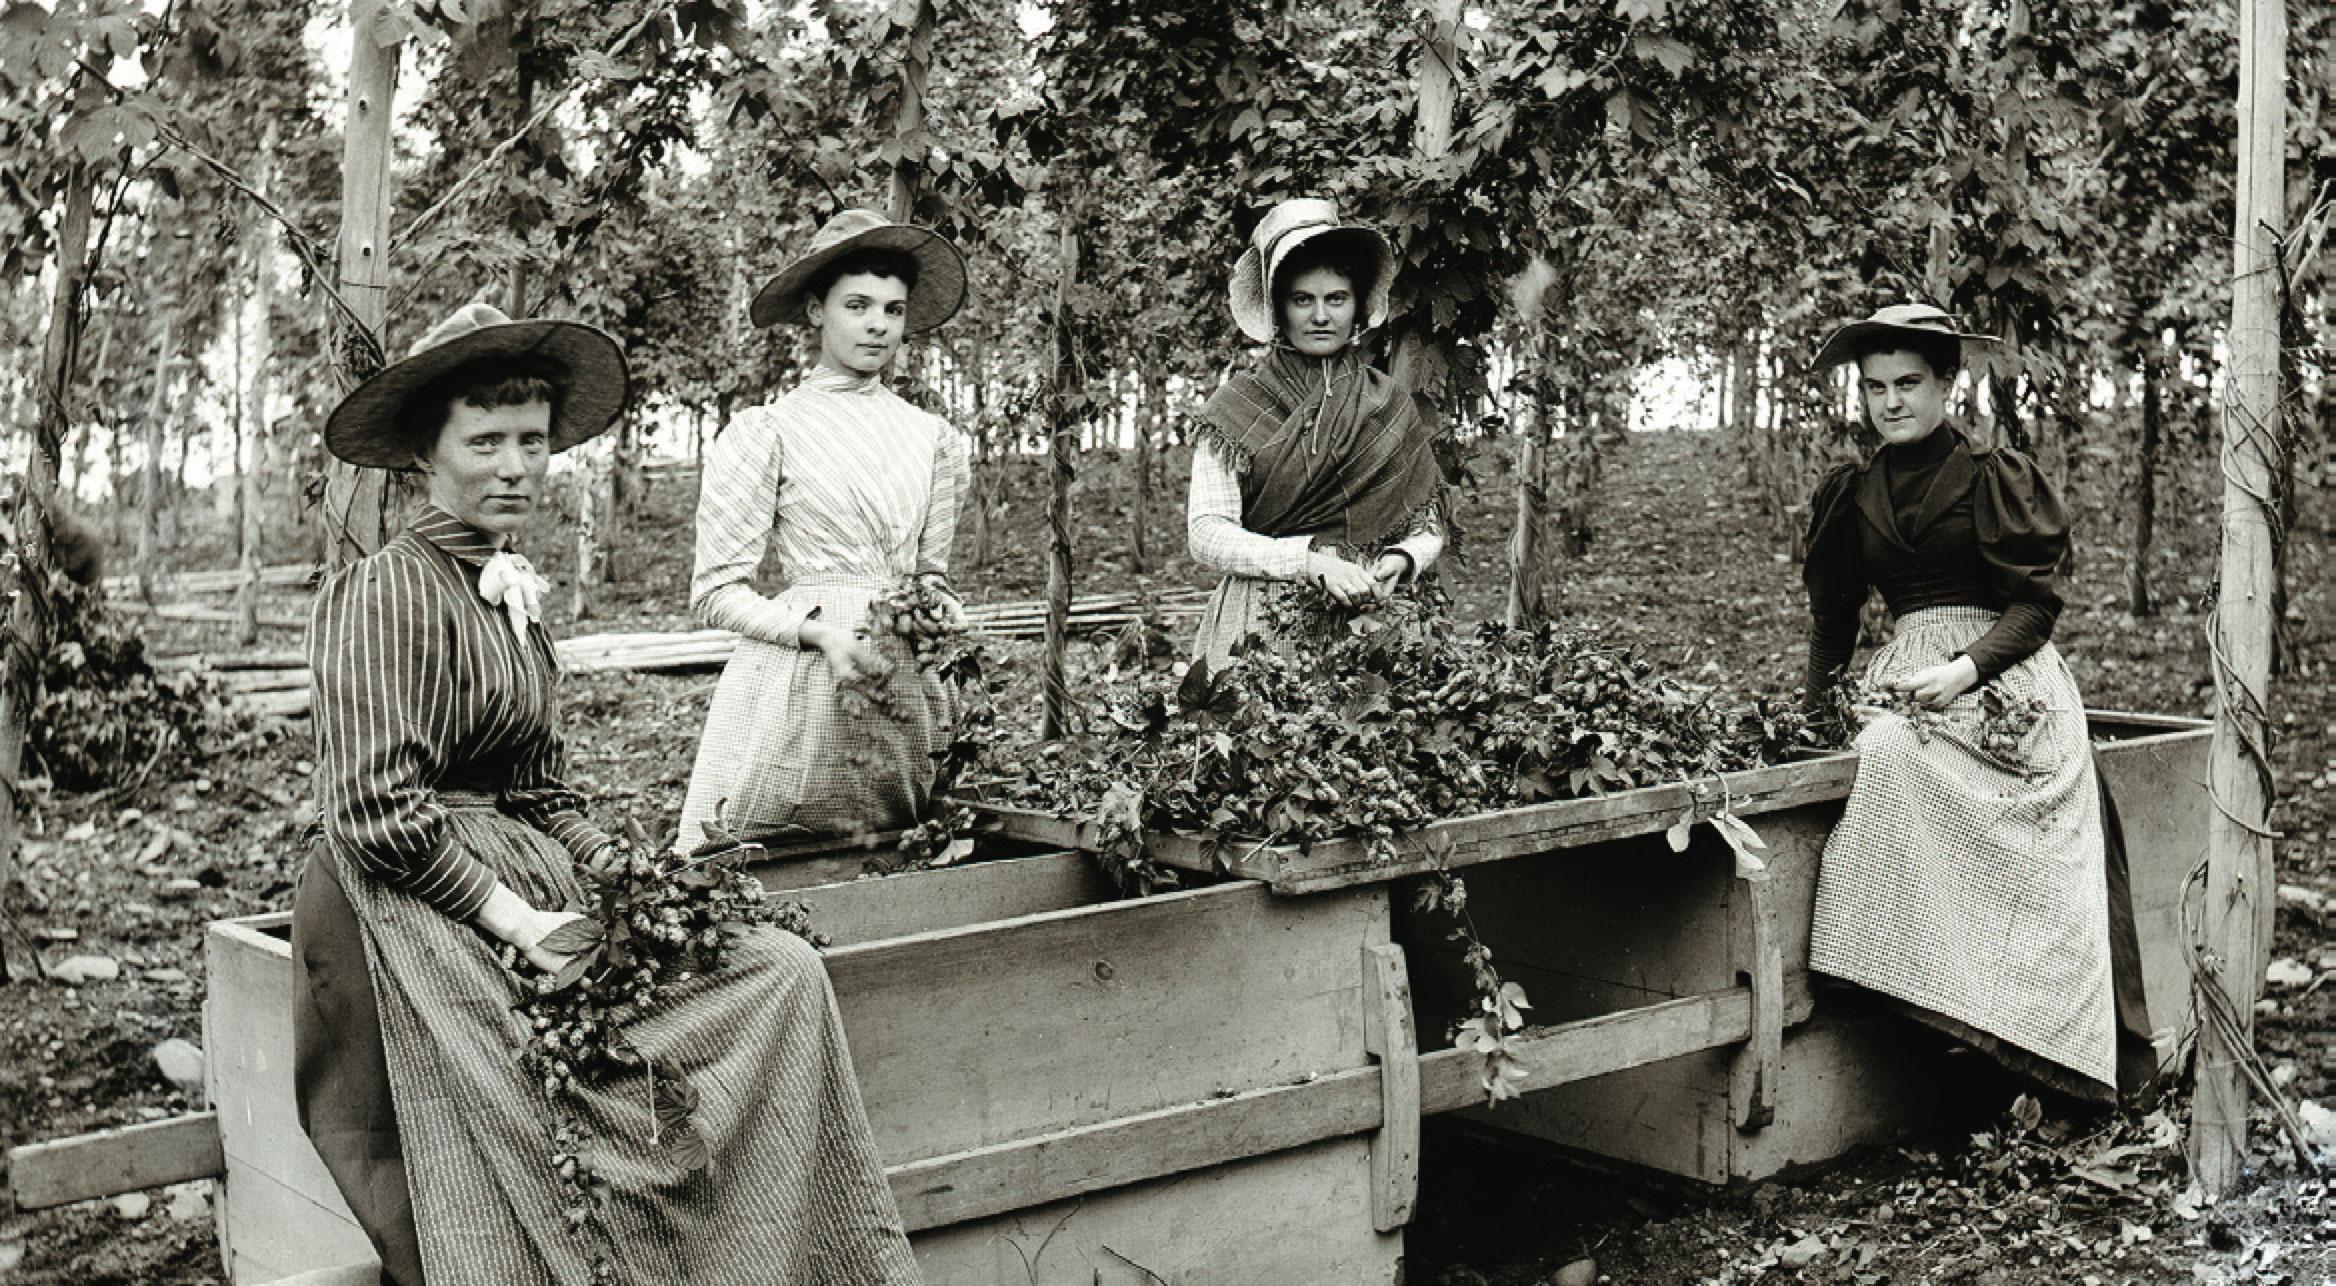 Hop Pickers, ca. 1880-1899